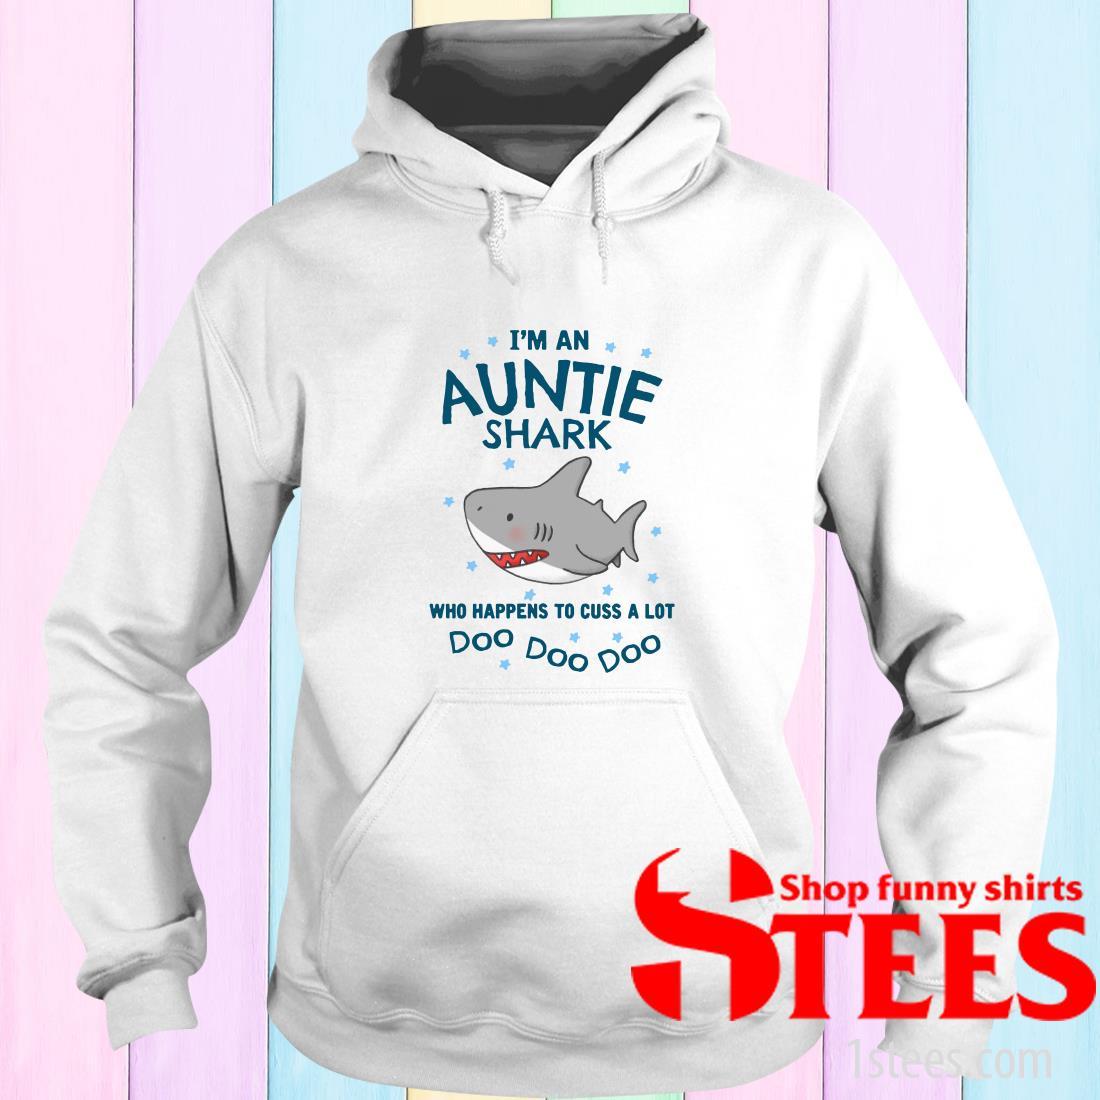 I'm An Auntie Shark Who Happens To Cuss A Lot Doo Doo Doo Hoodies